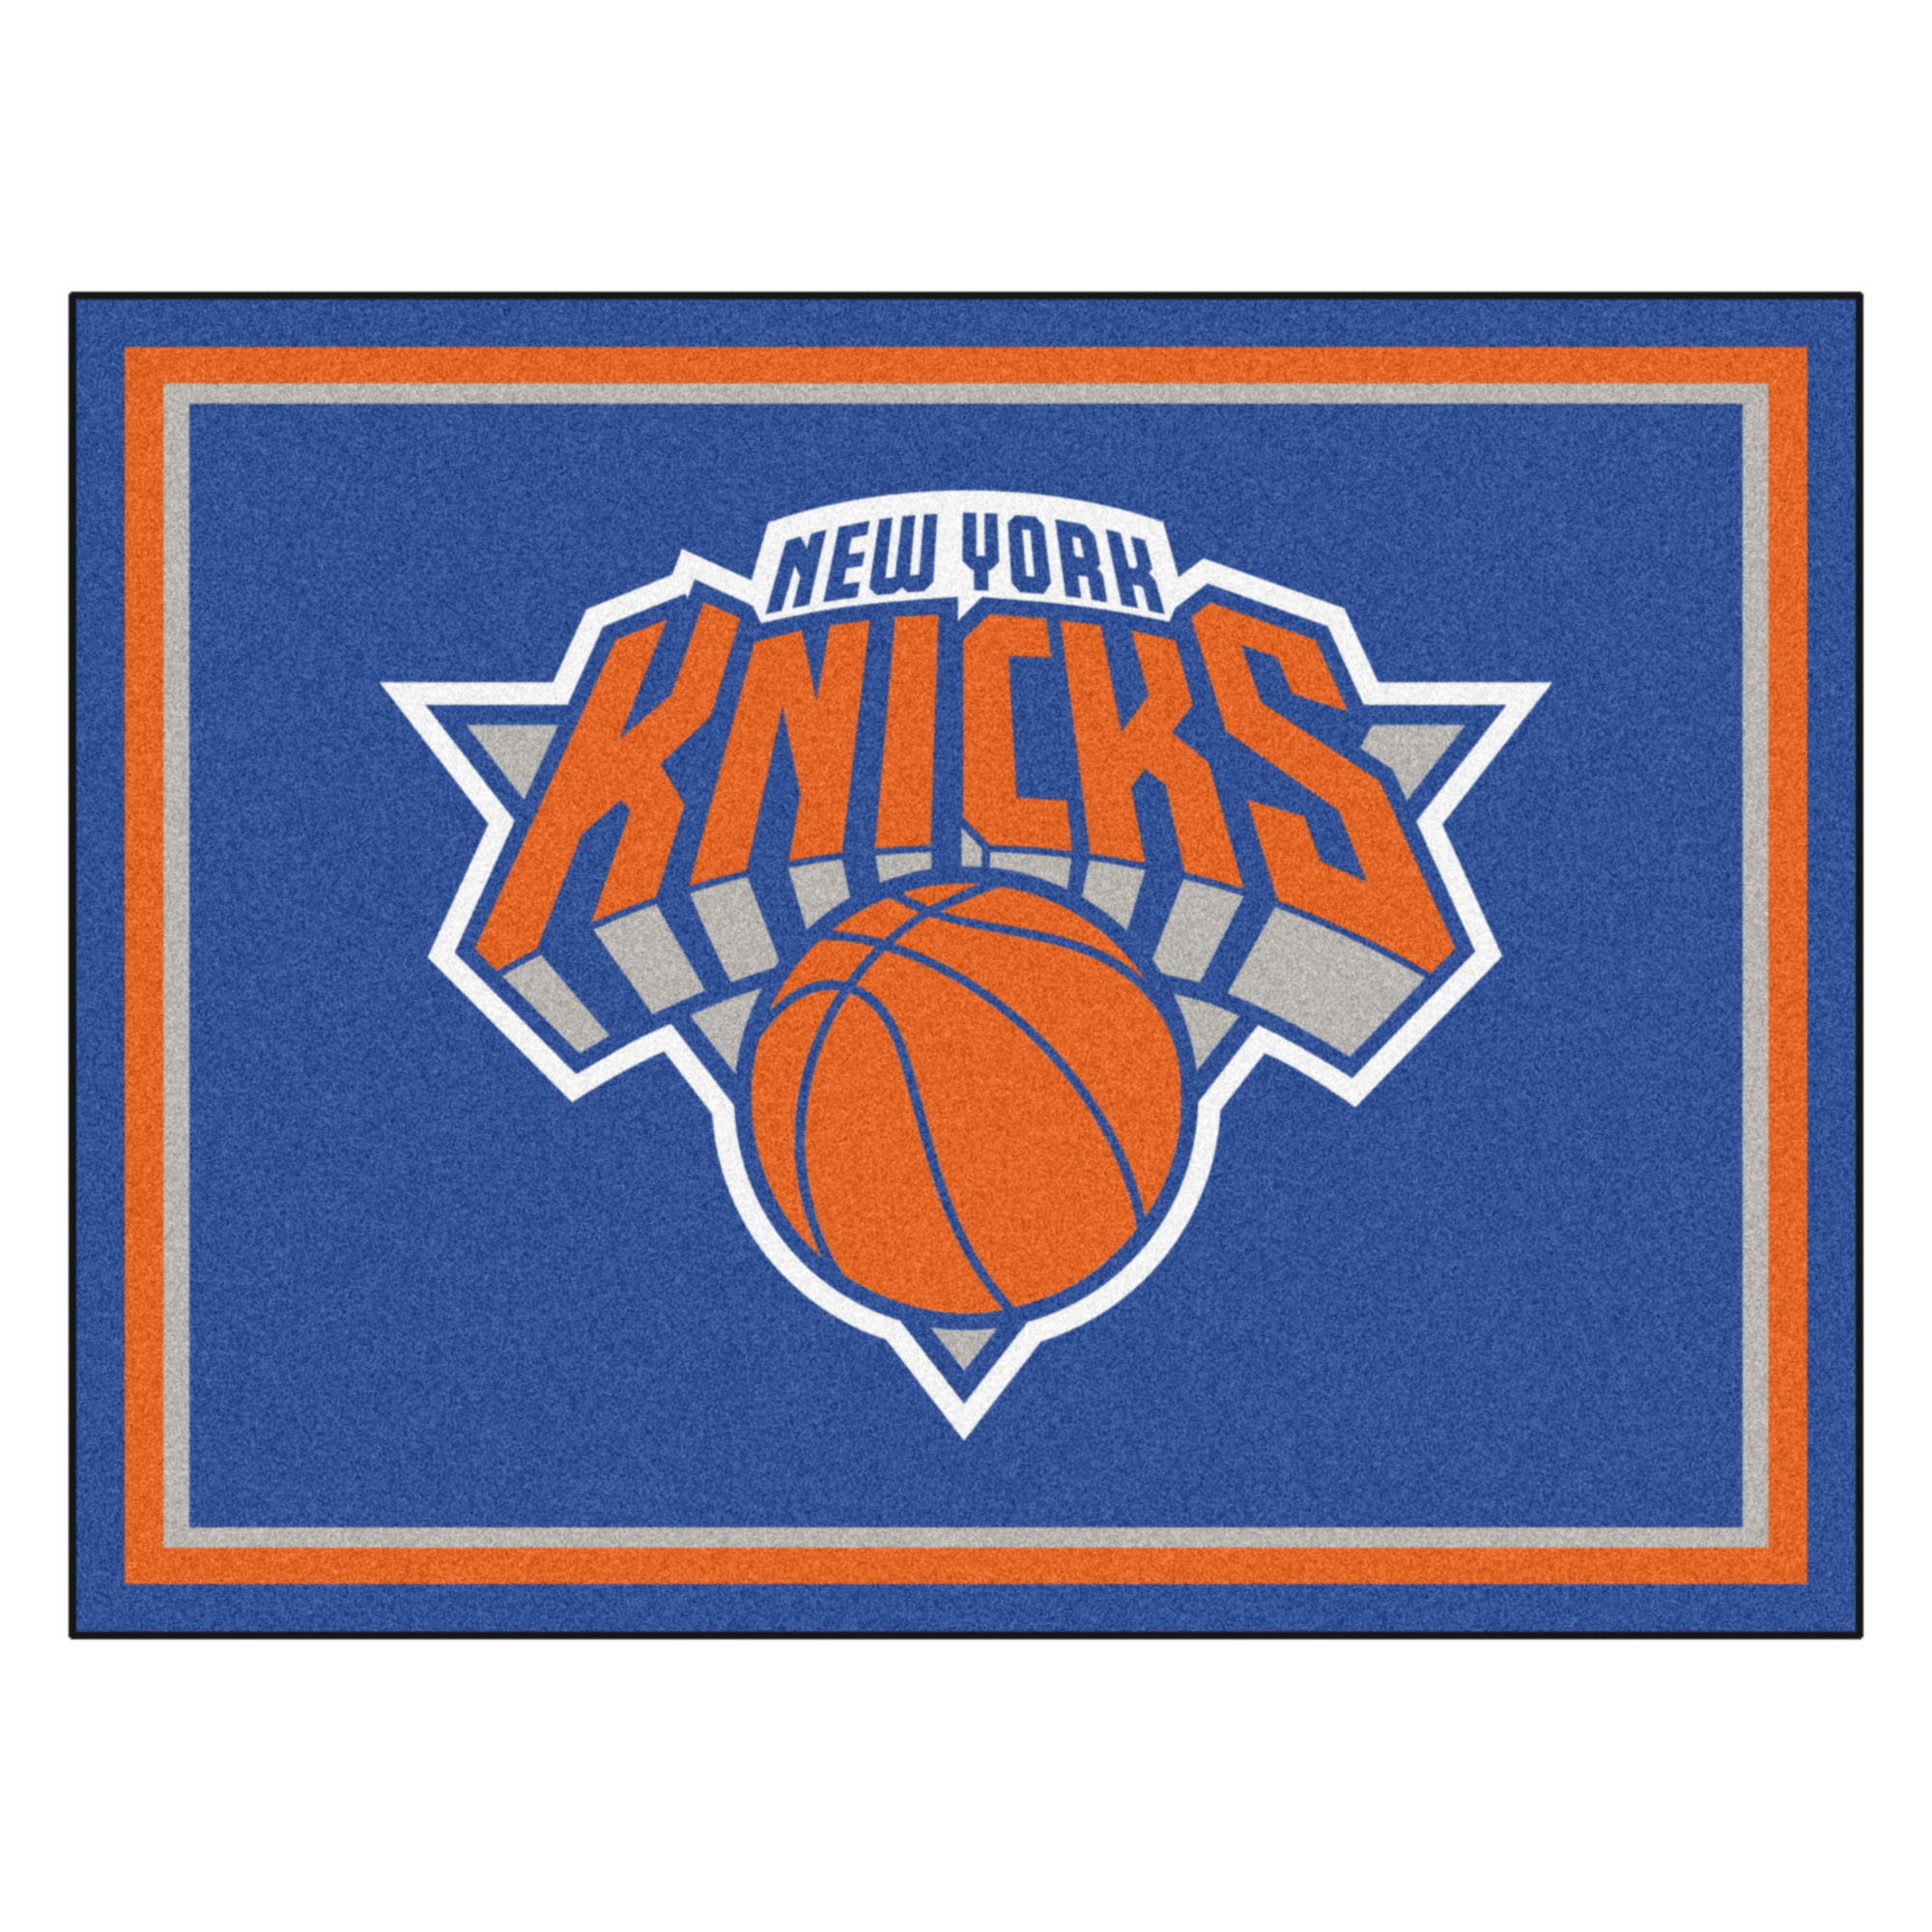 NBA - New York Knicks 8'x10' Rug